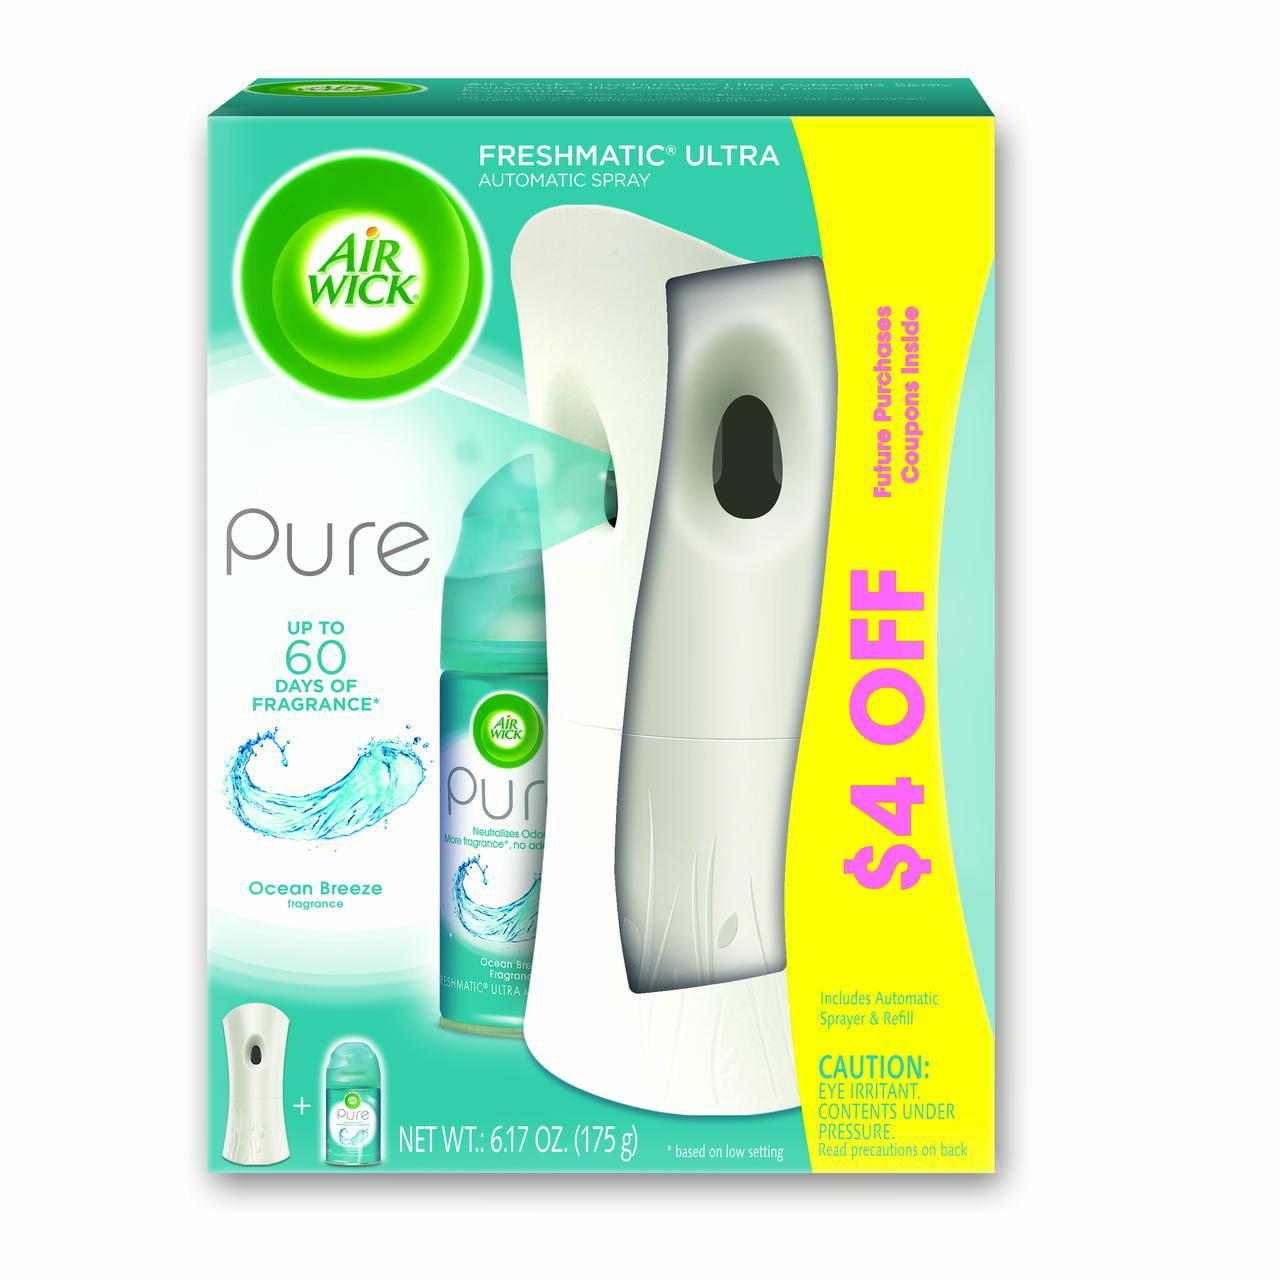 Air Wick Pure Freshmatic Automatic Spray Kit (Gadget + 1 Refill), Ocean Breeze, Air Freshener